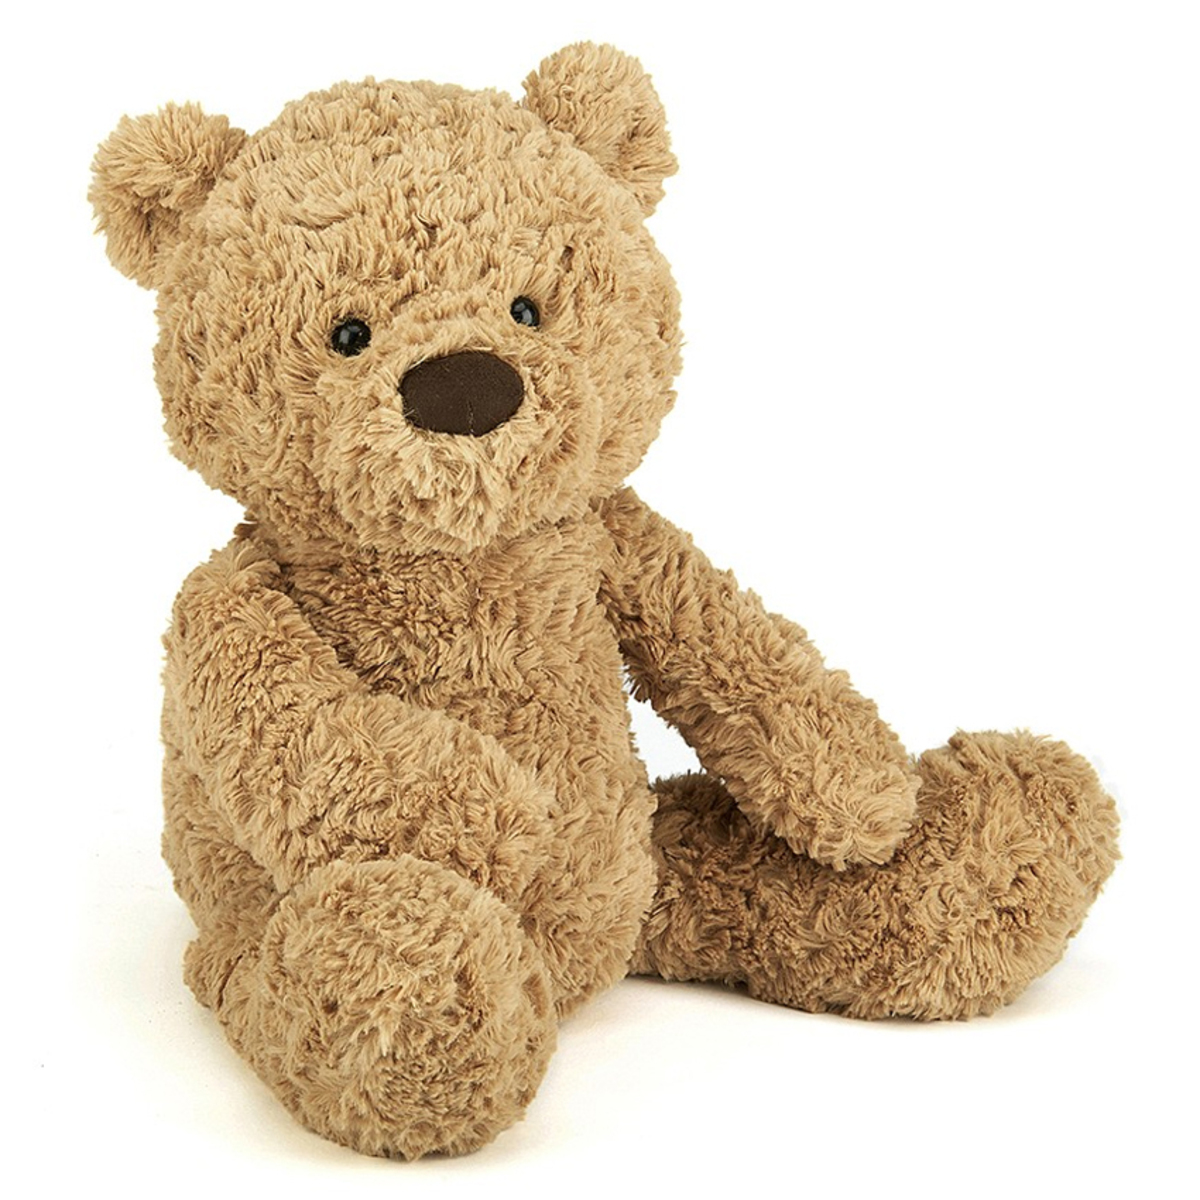 Peluche Bumbly Bear - Medium